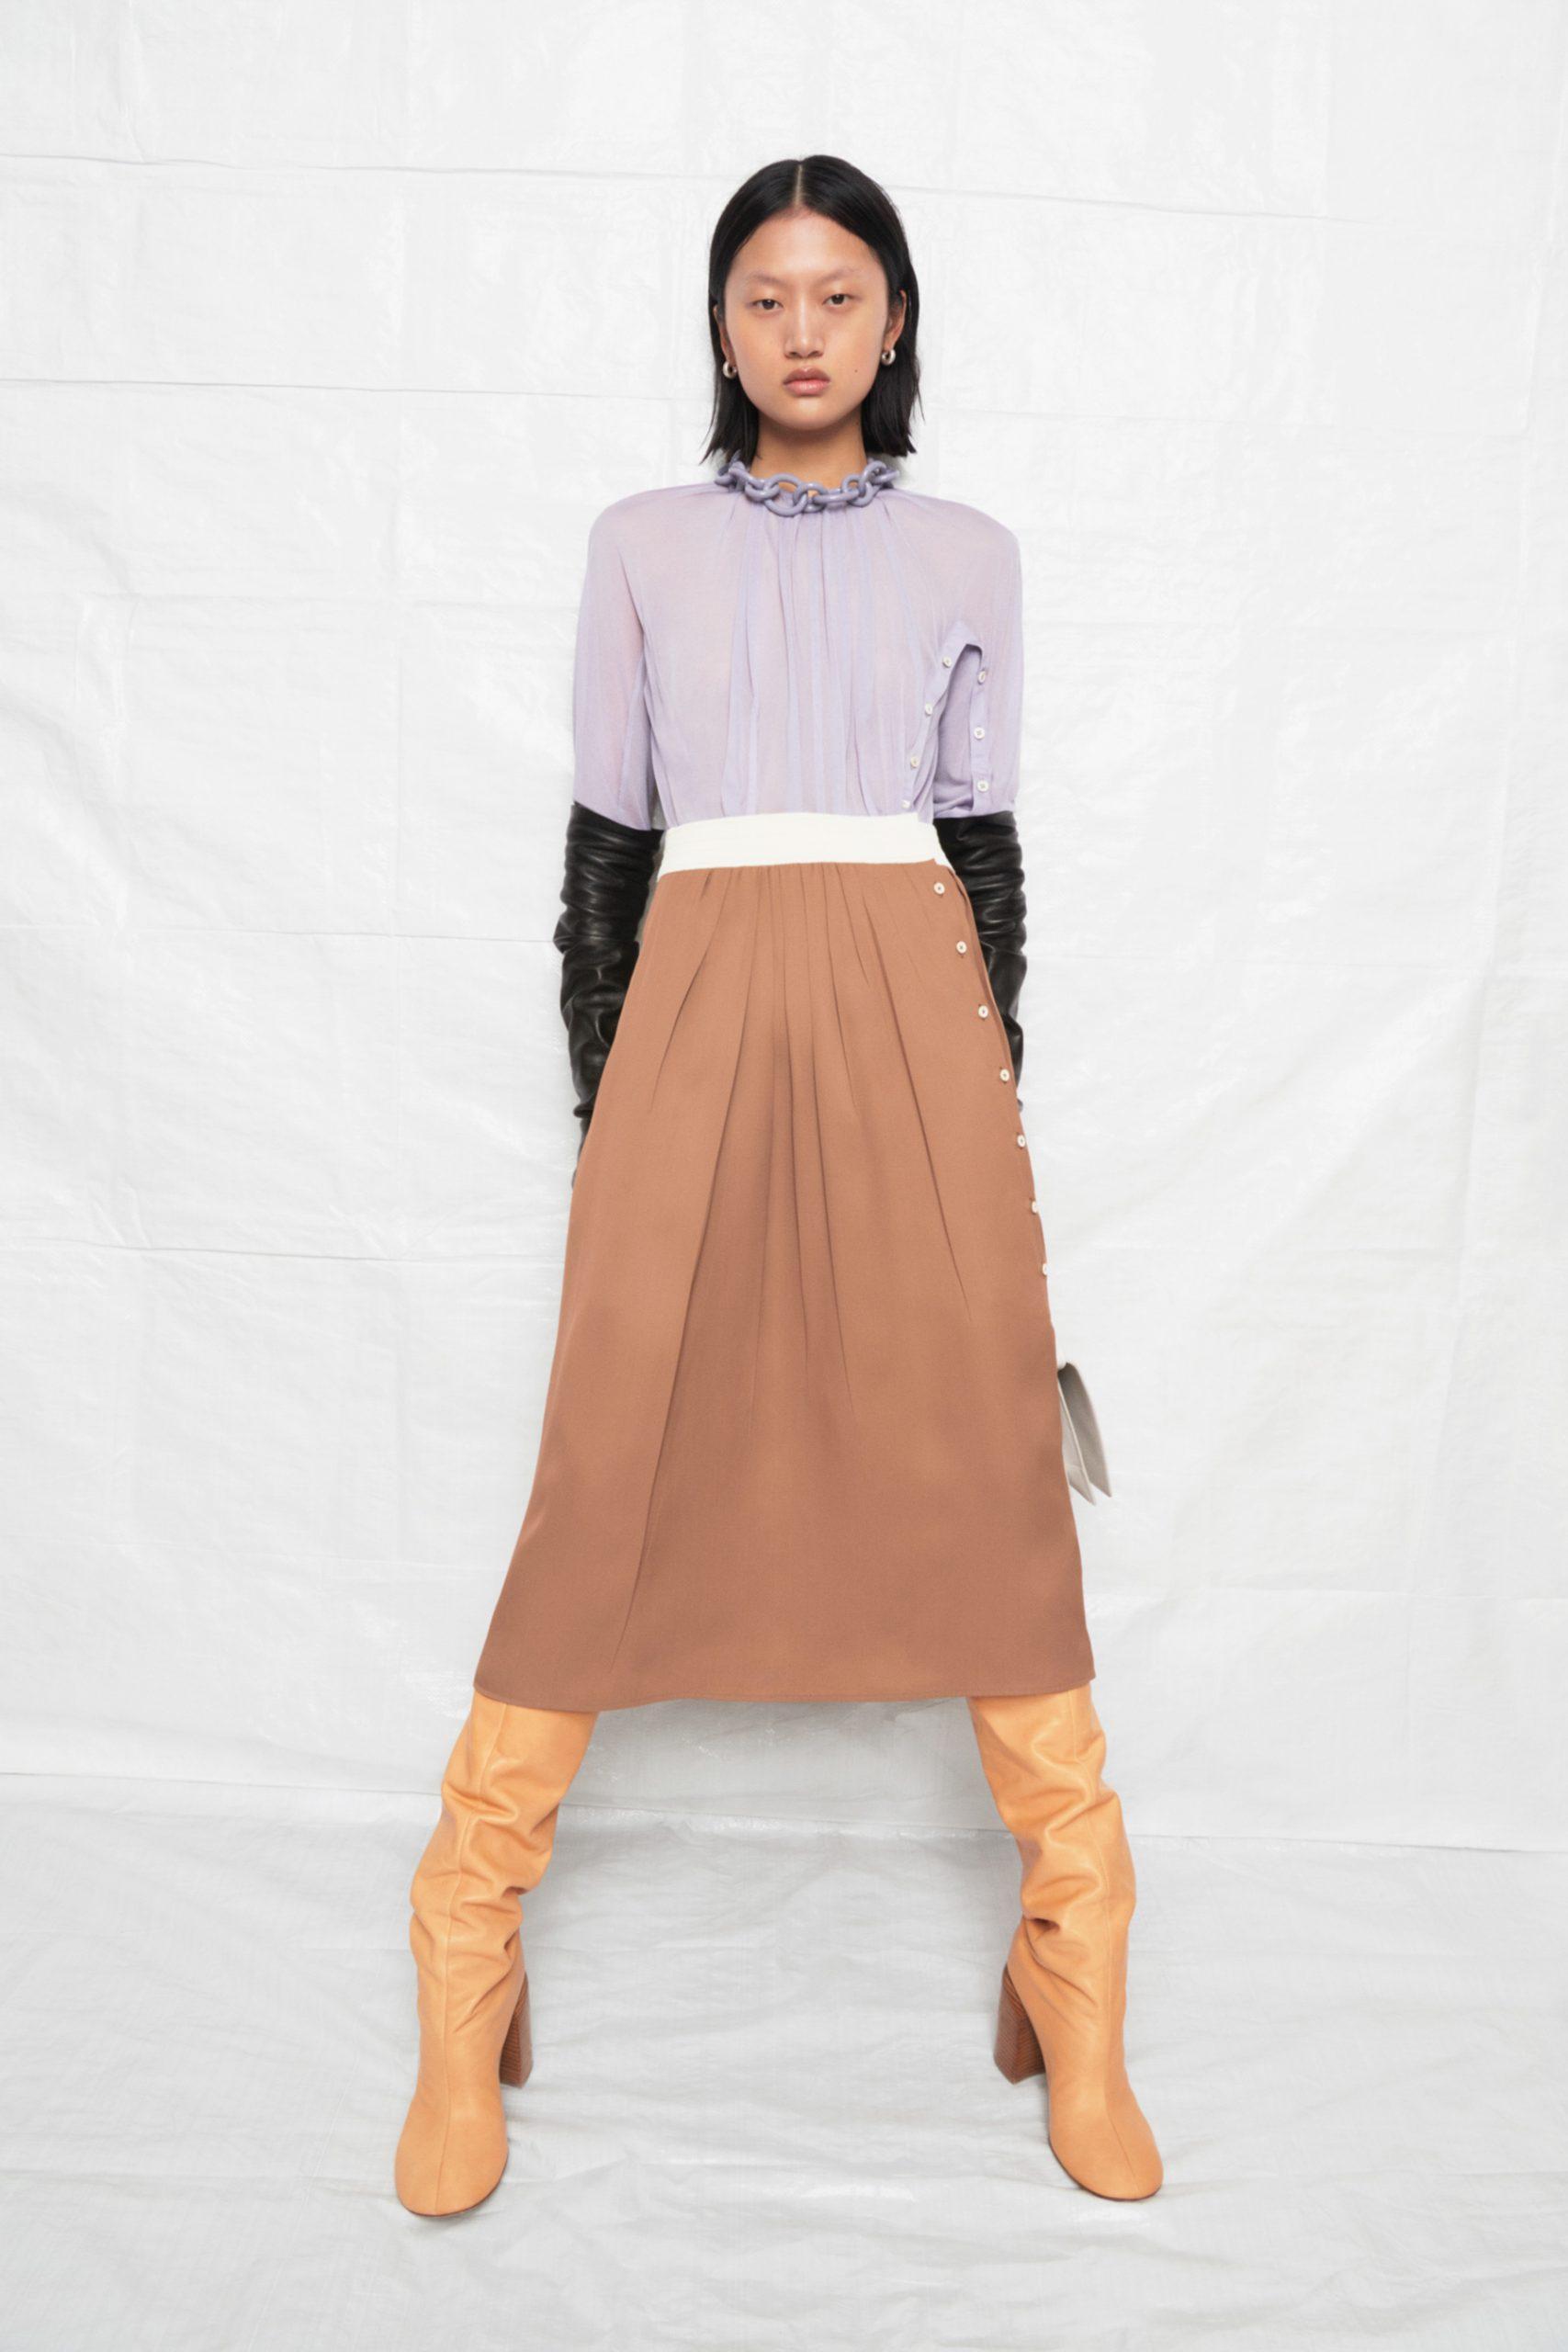 Lavender & Lilac Colors Fall 2021 Fashion Trend